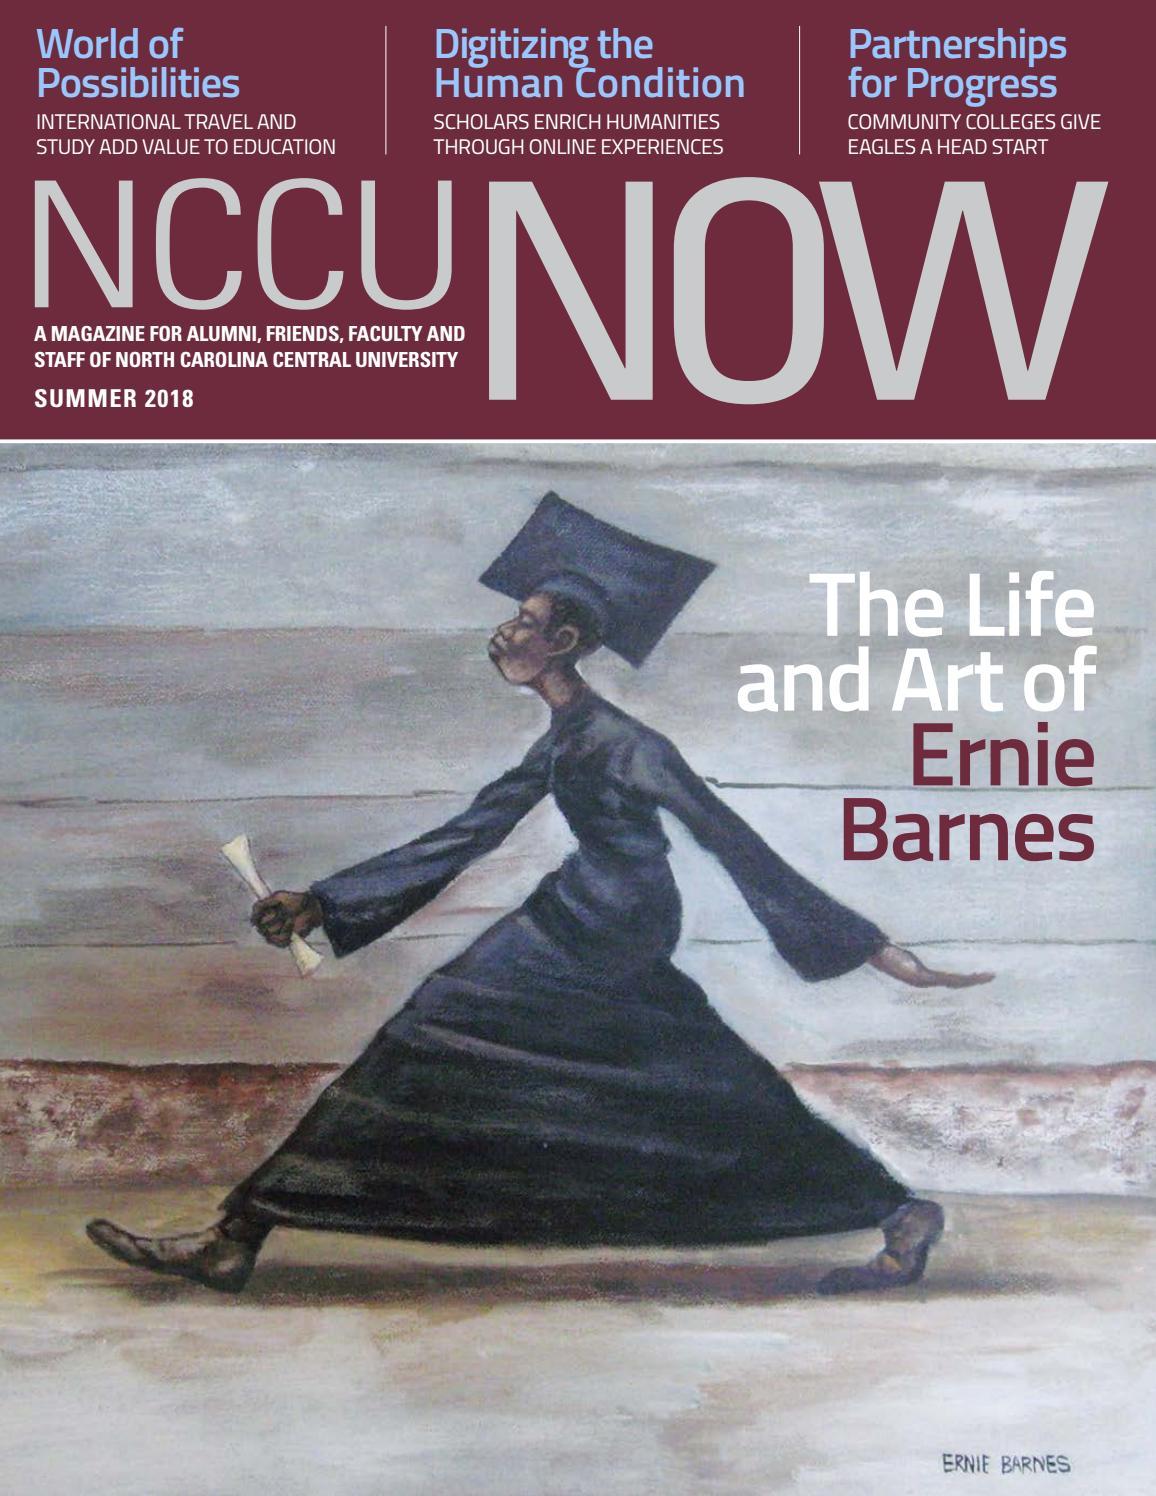 NCCU Now Alumni Magazine Summer 2018 by North Carolina Central